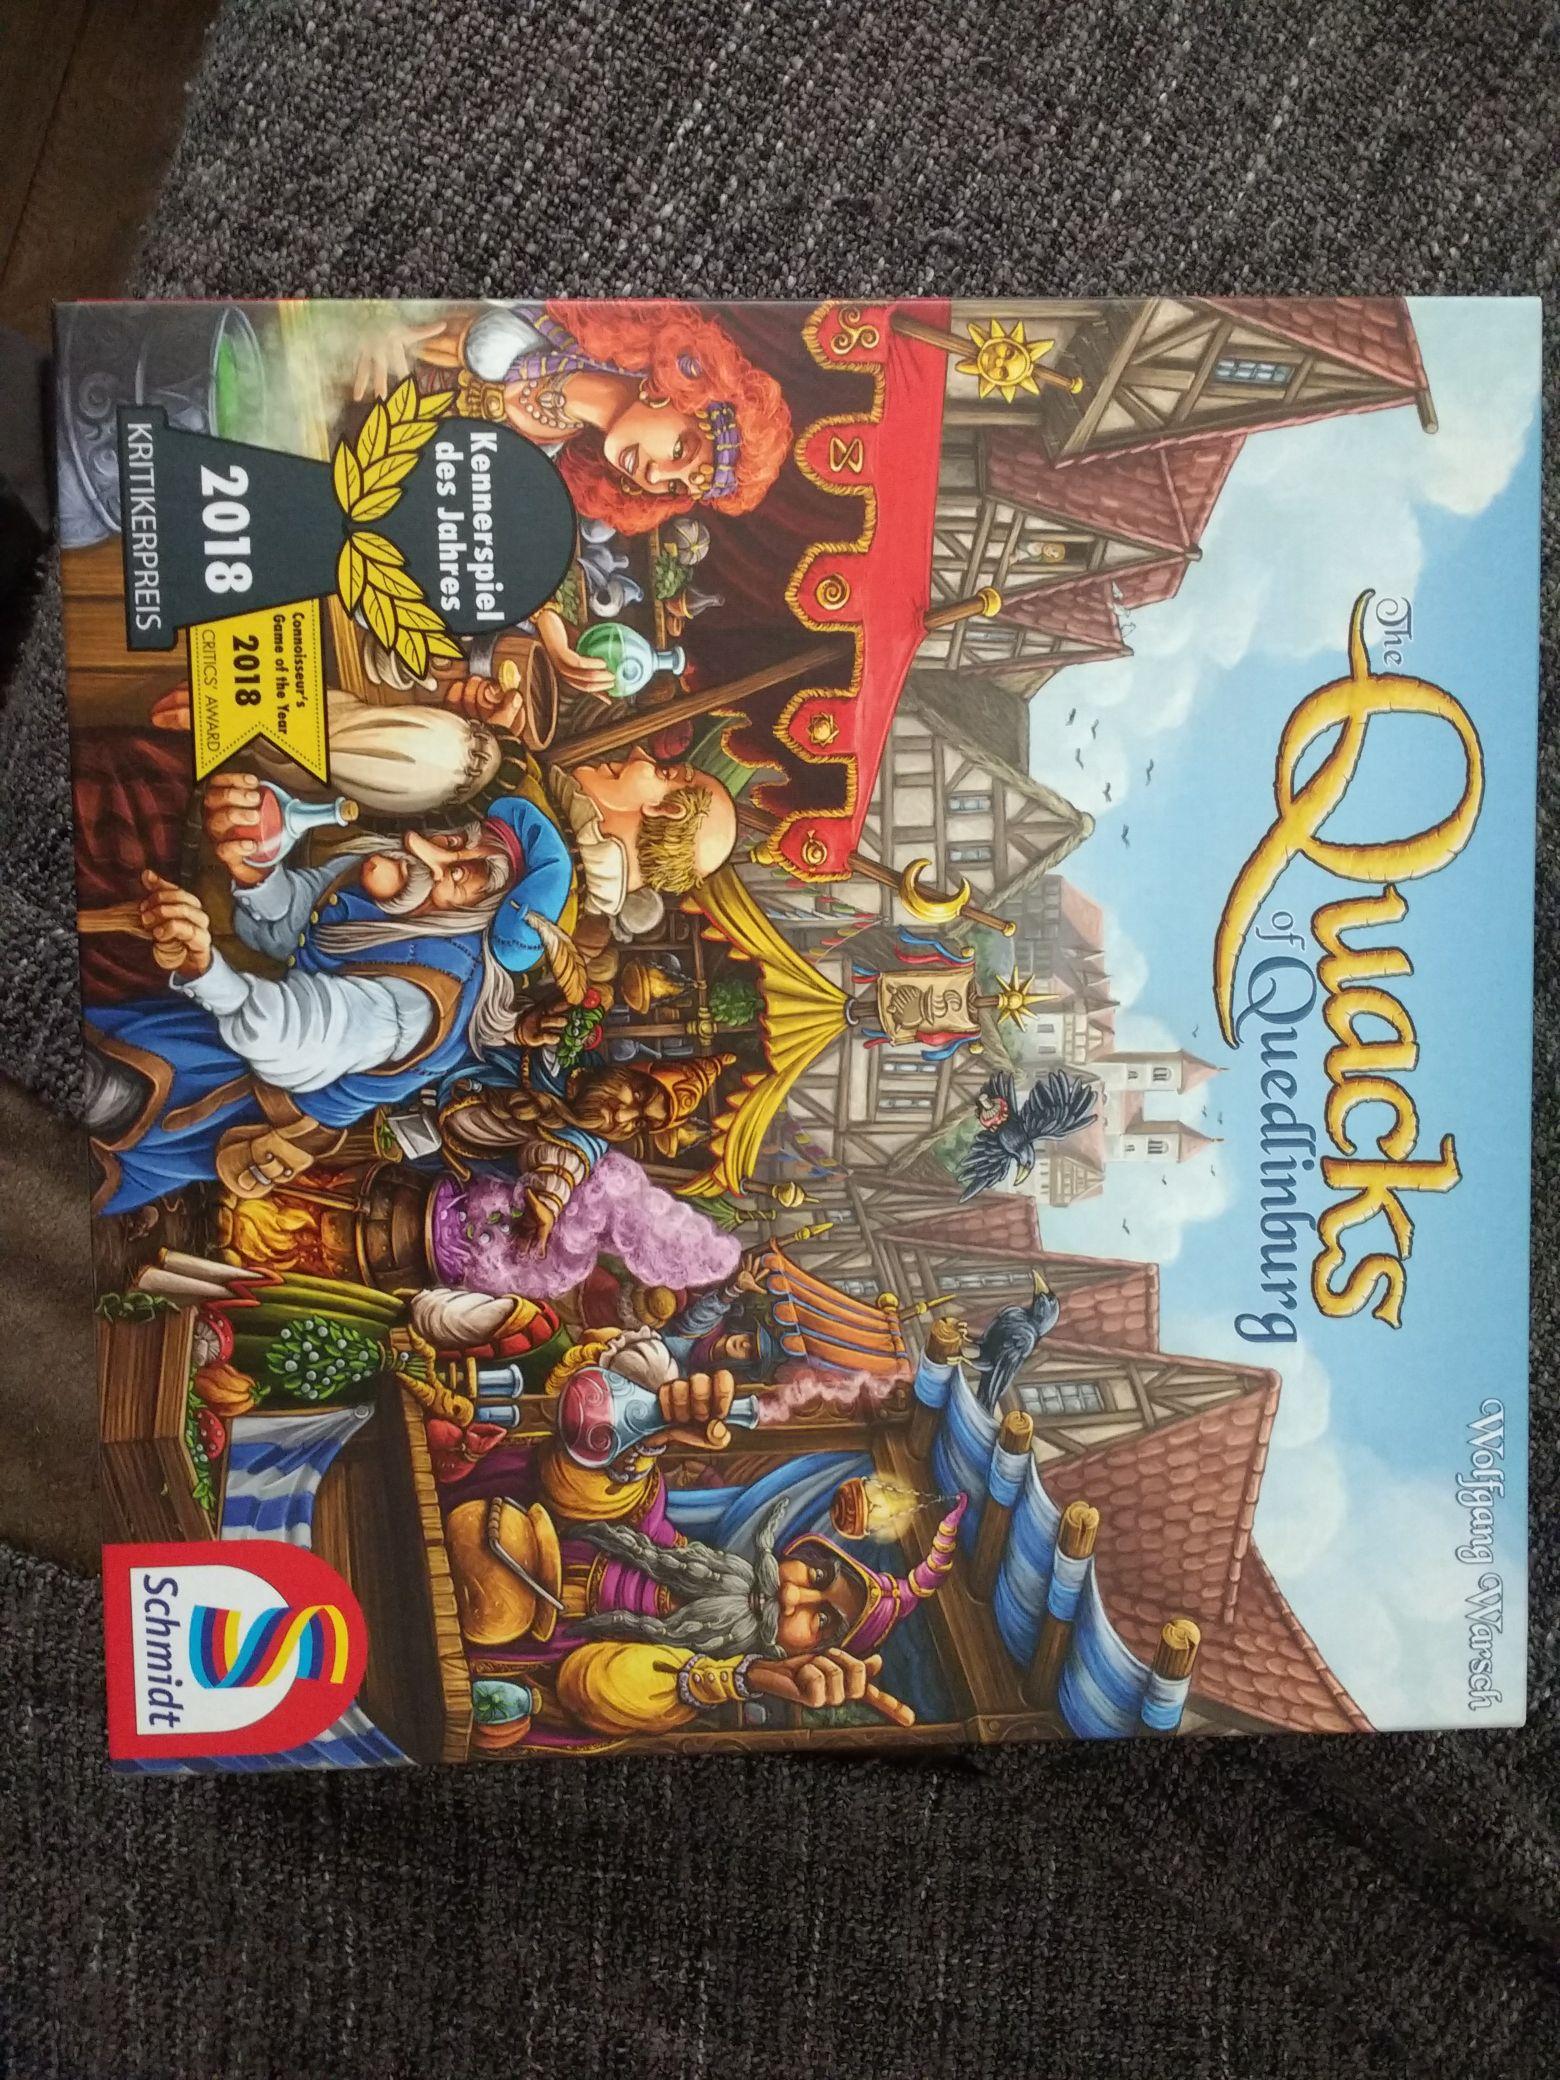 Quacks of Quedlinburg £25.40 at board-game (zatu games)